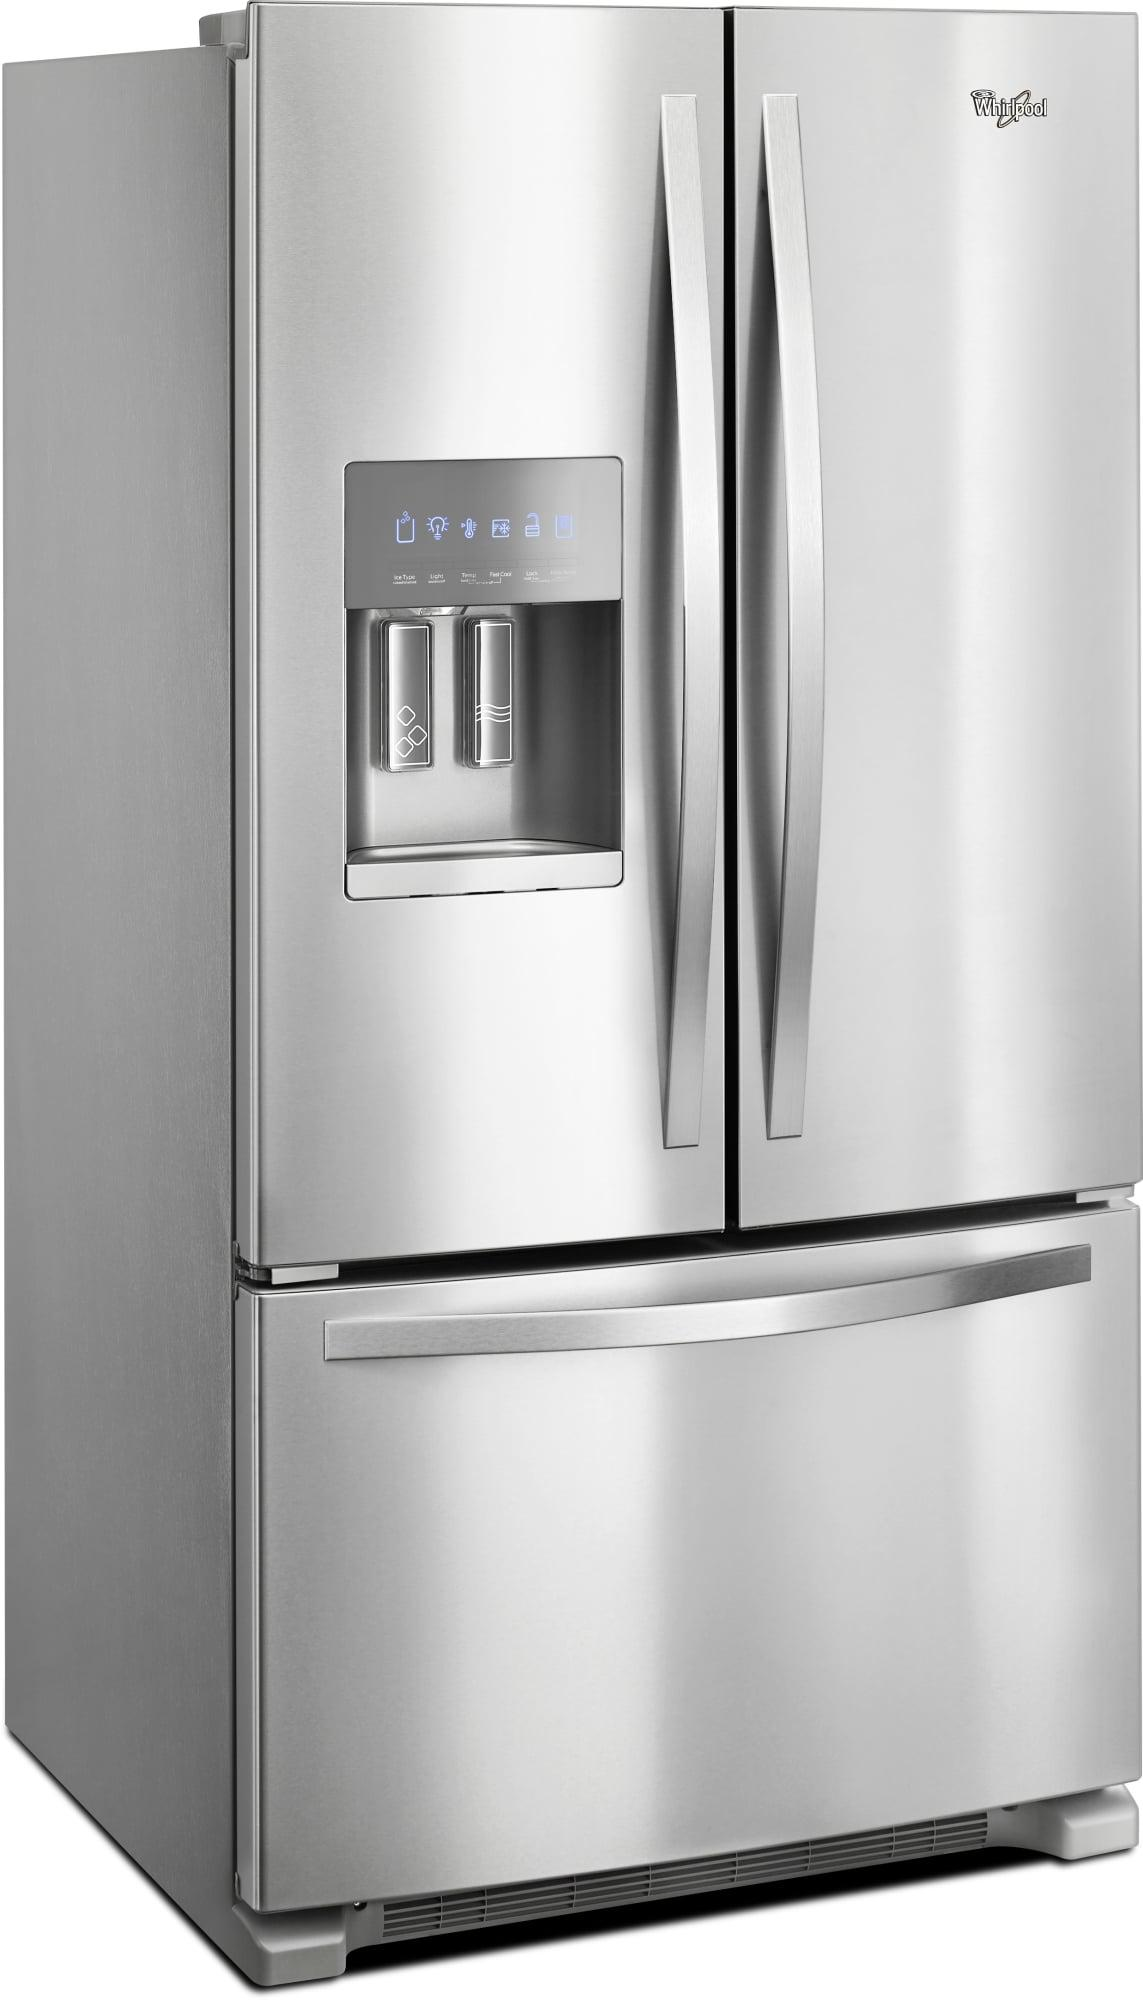 Wrf555sdhv Whirlpool Wrf555sdhv French Door Refrigerators